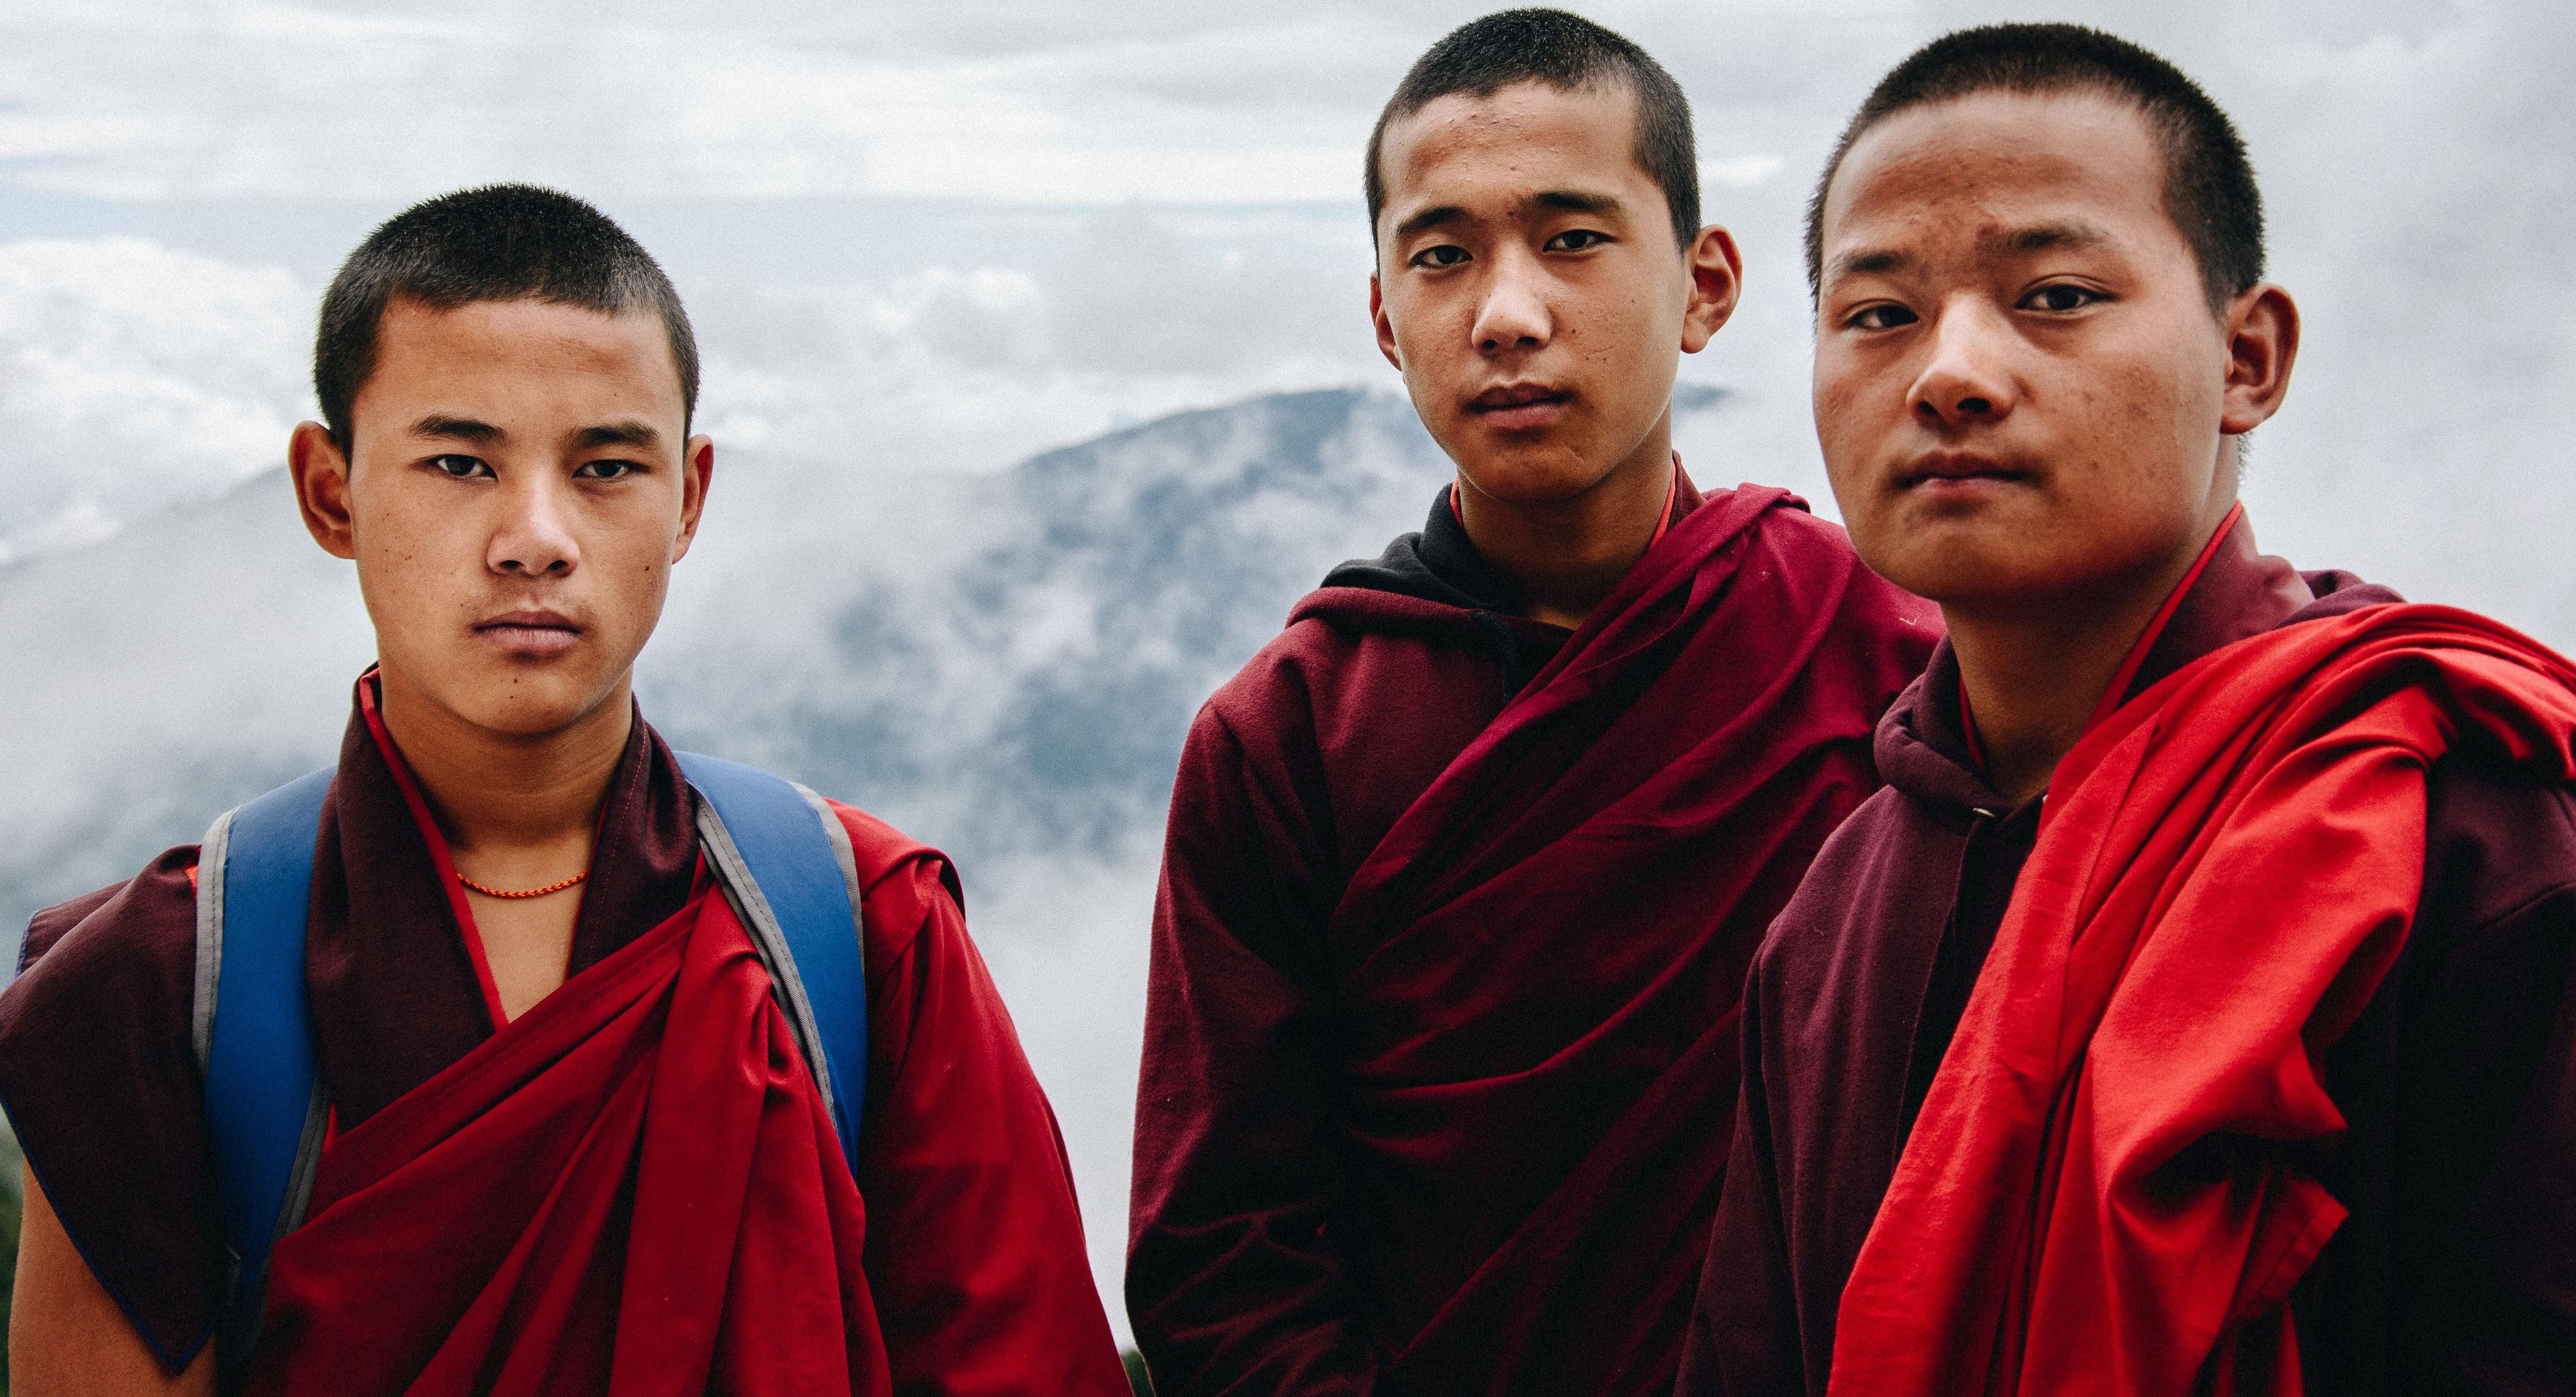 Three men standing on a mountain